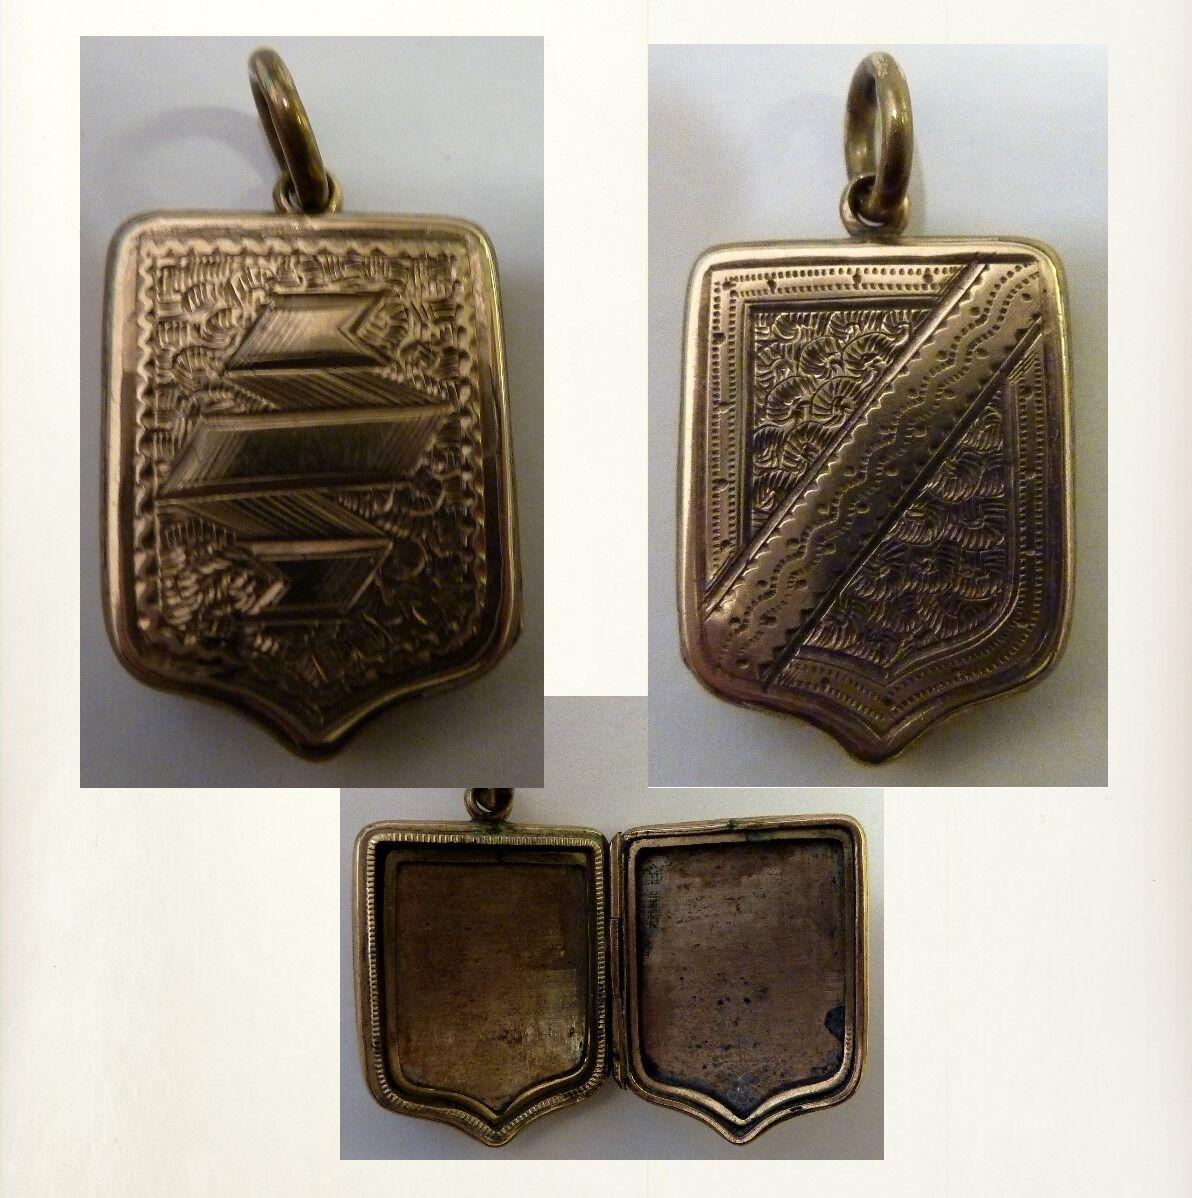 Medaglione 10ct oro Locket    Back & Front   originale del 1910 Inghilterra b56fe0